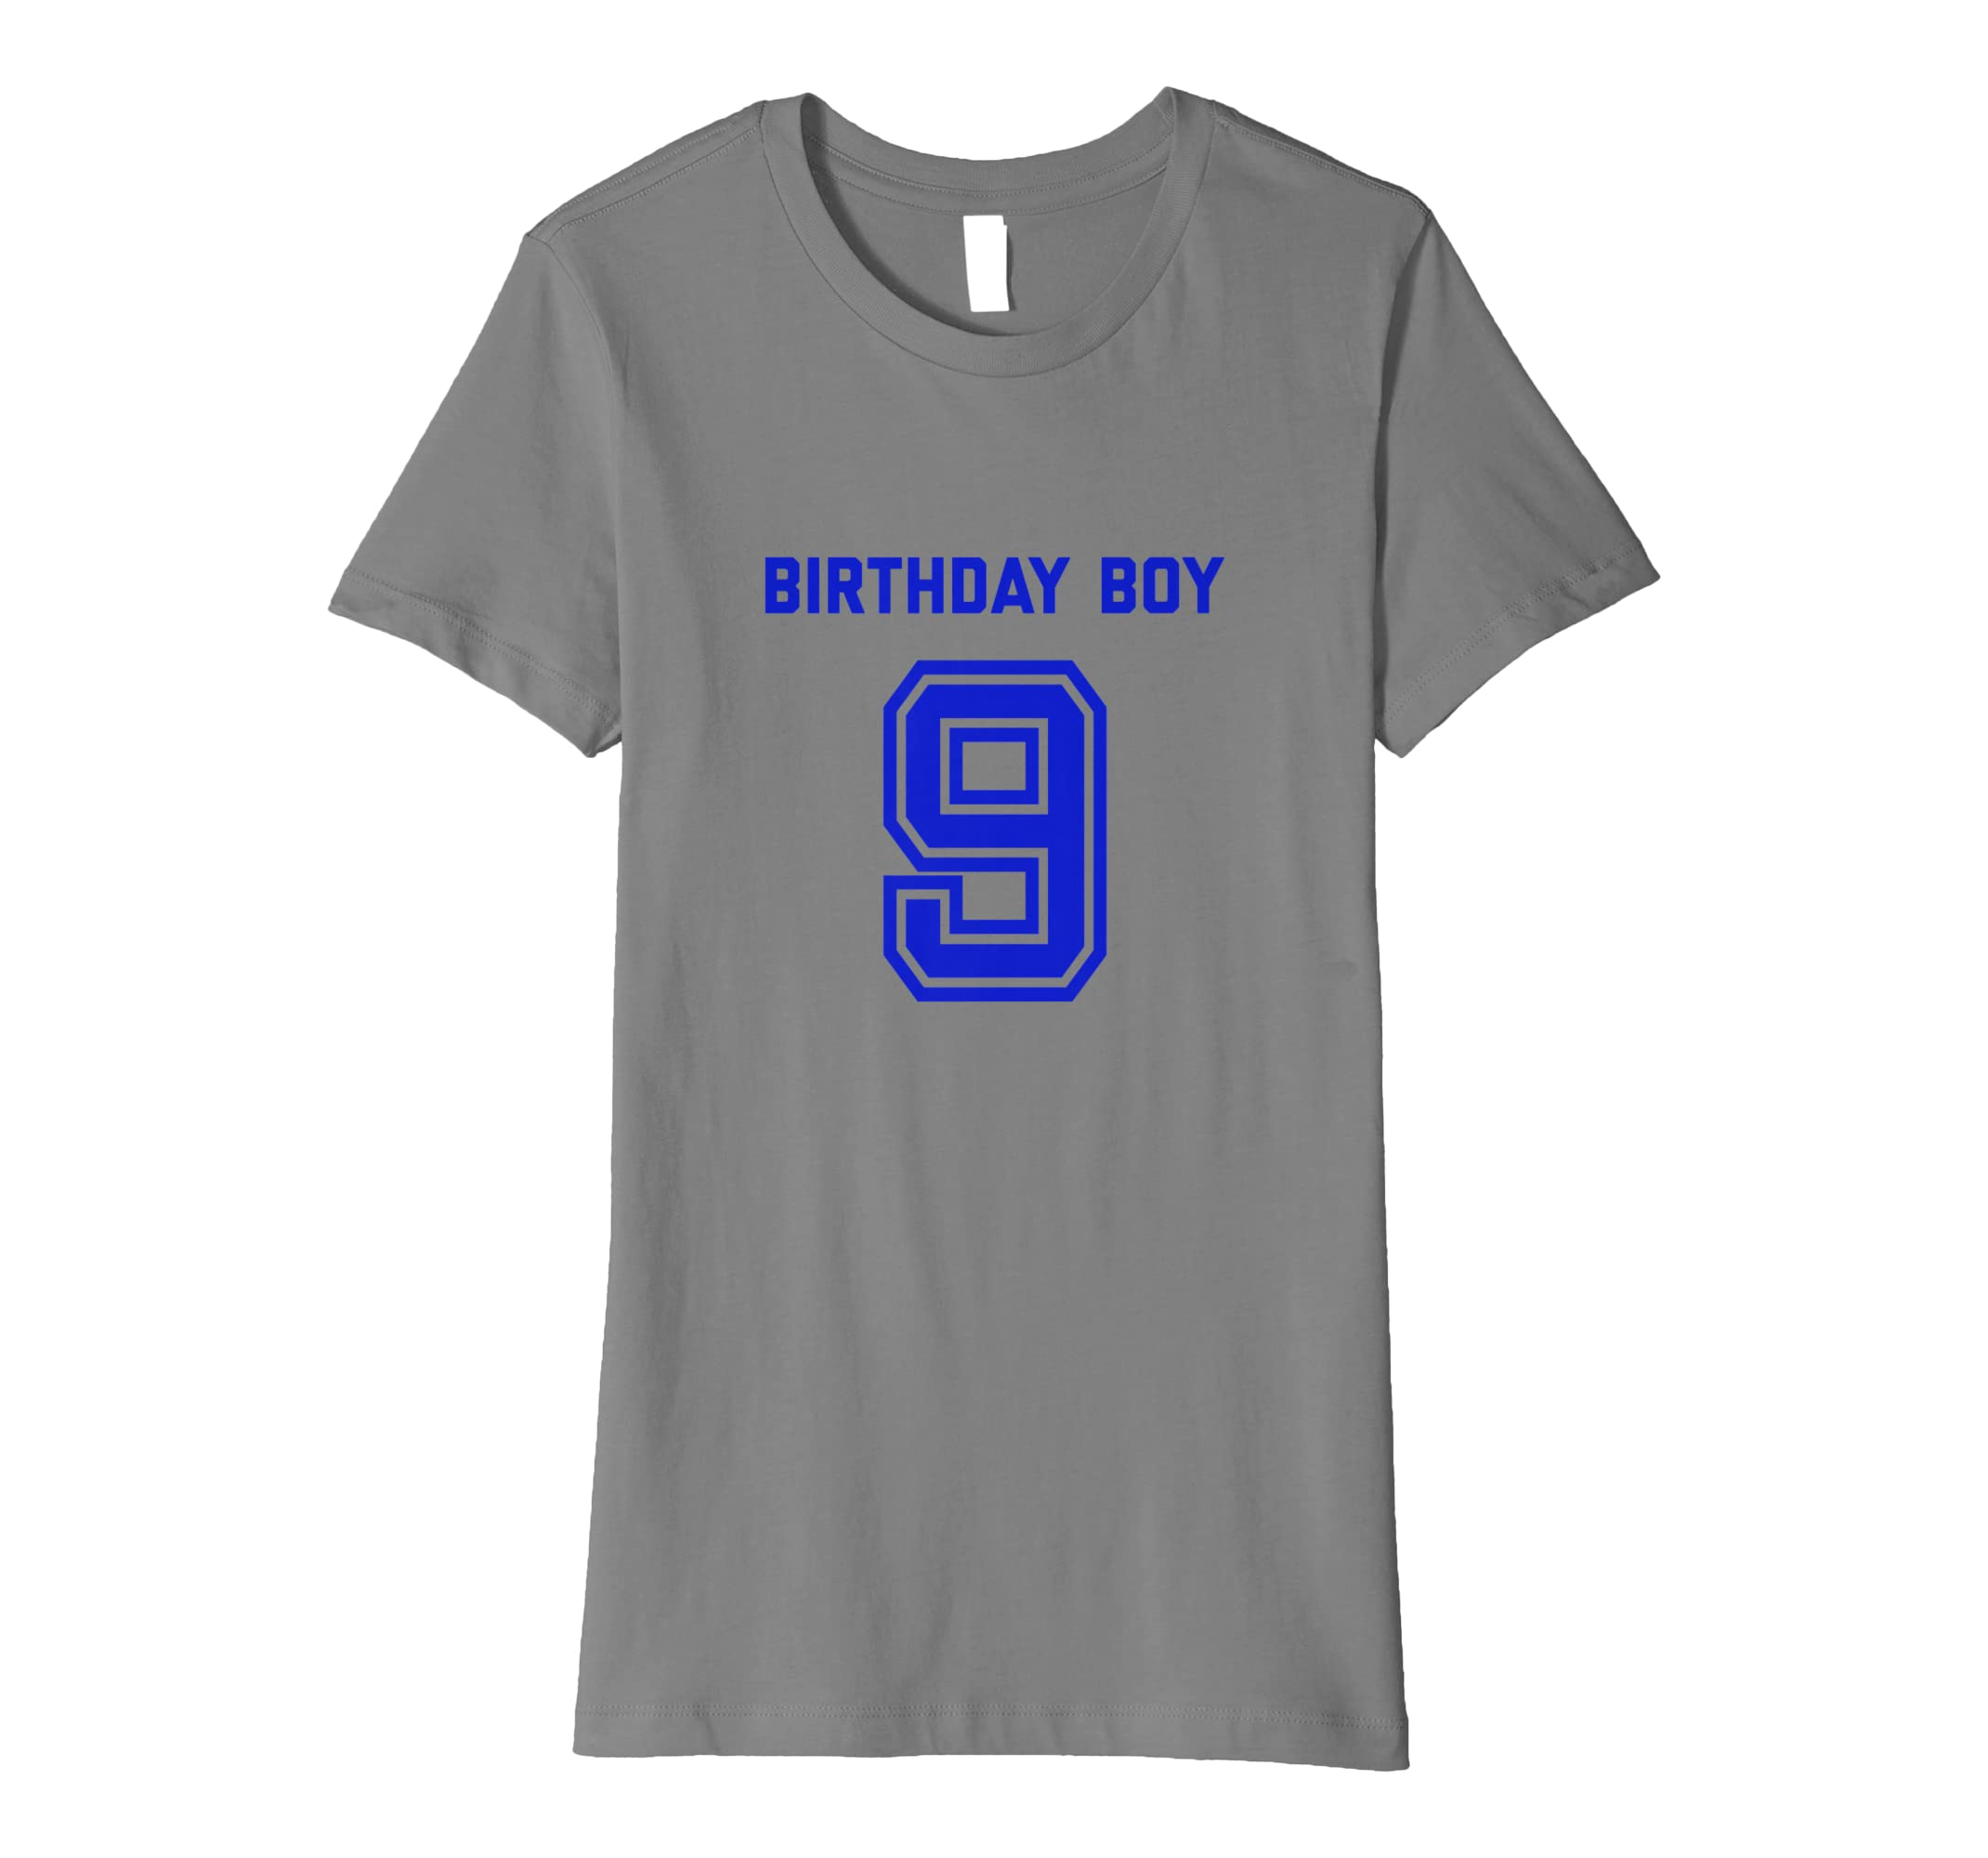 9th Birthday Shirt Gift Age 9 Year Old Boy Tshirt Boys Tee Amazoncouk Clothing